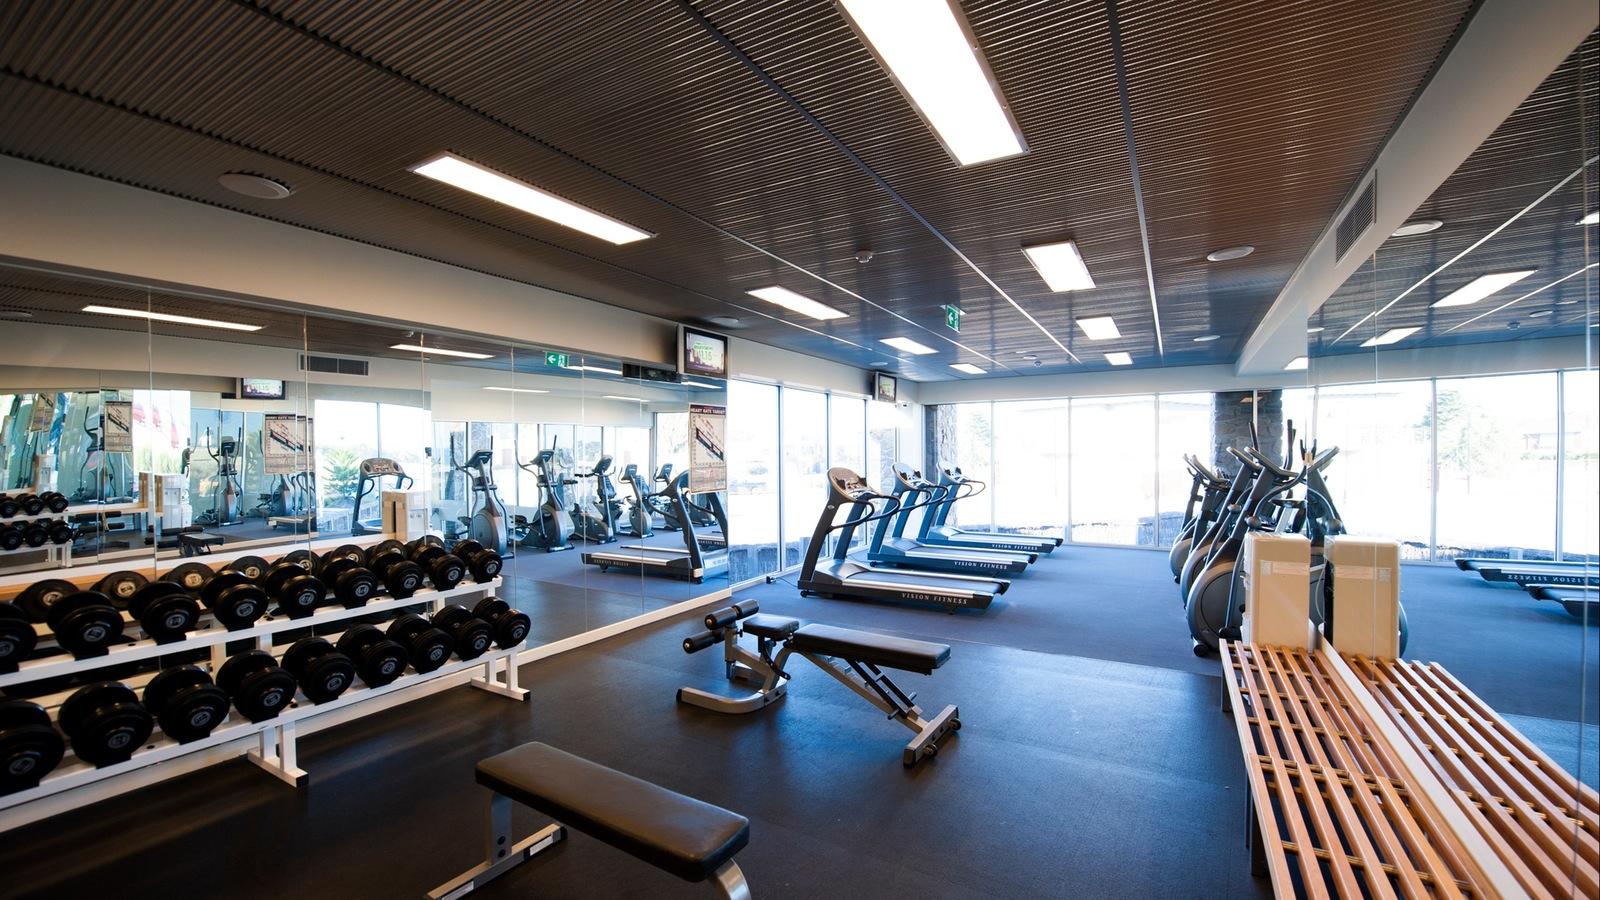 Wyndham Resort Torquay fitness gym facilities